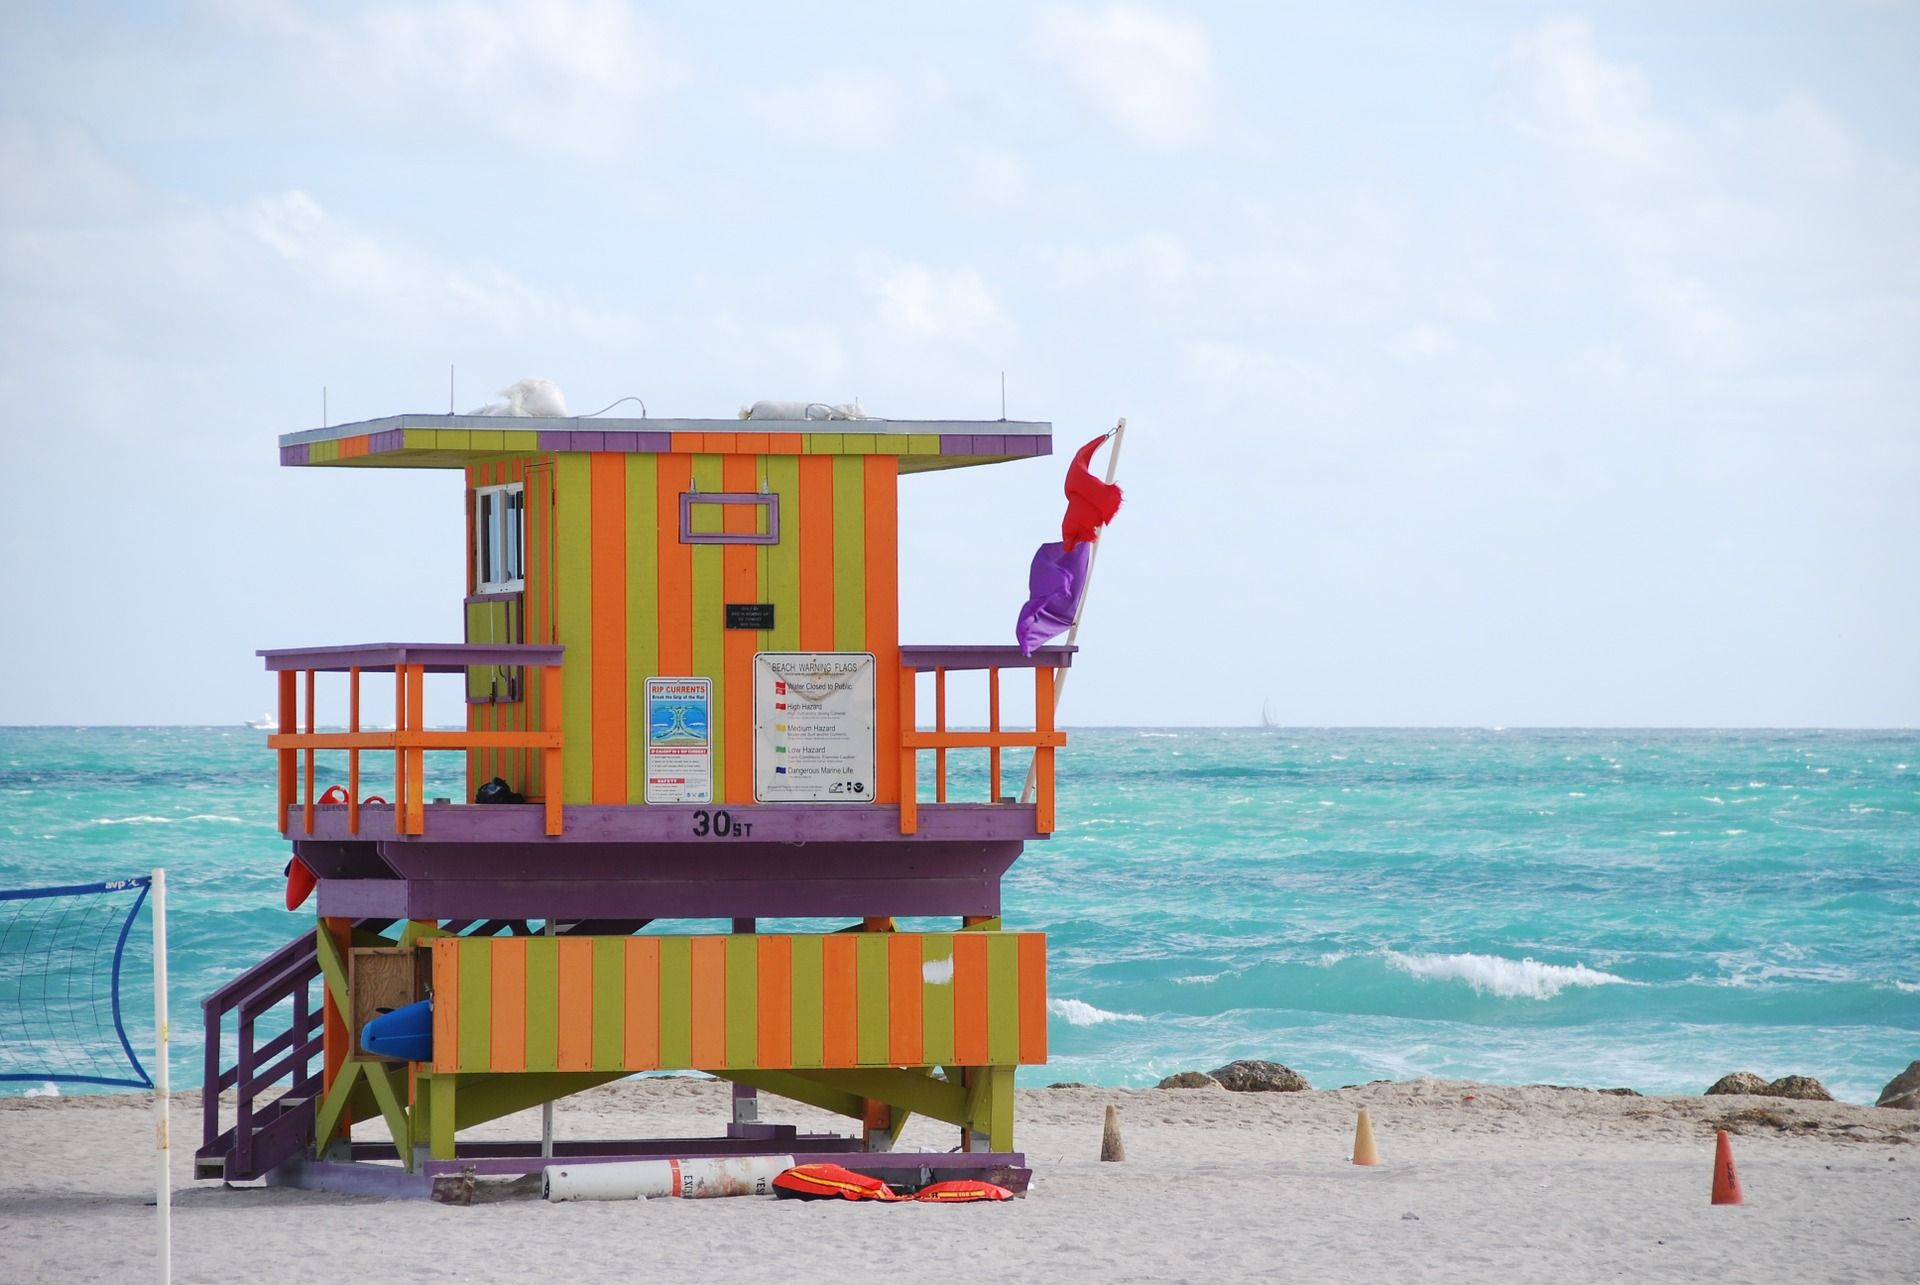 Sprachschule Miami